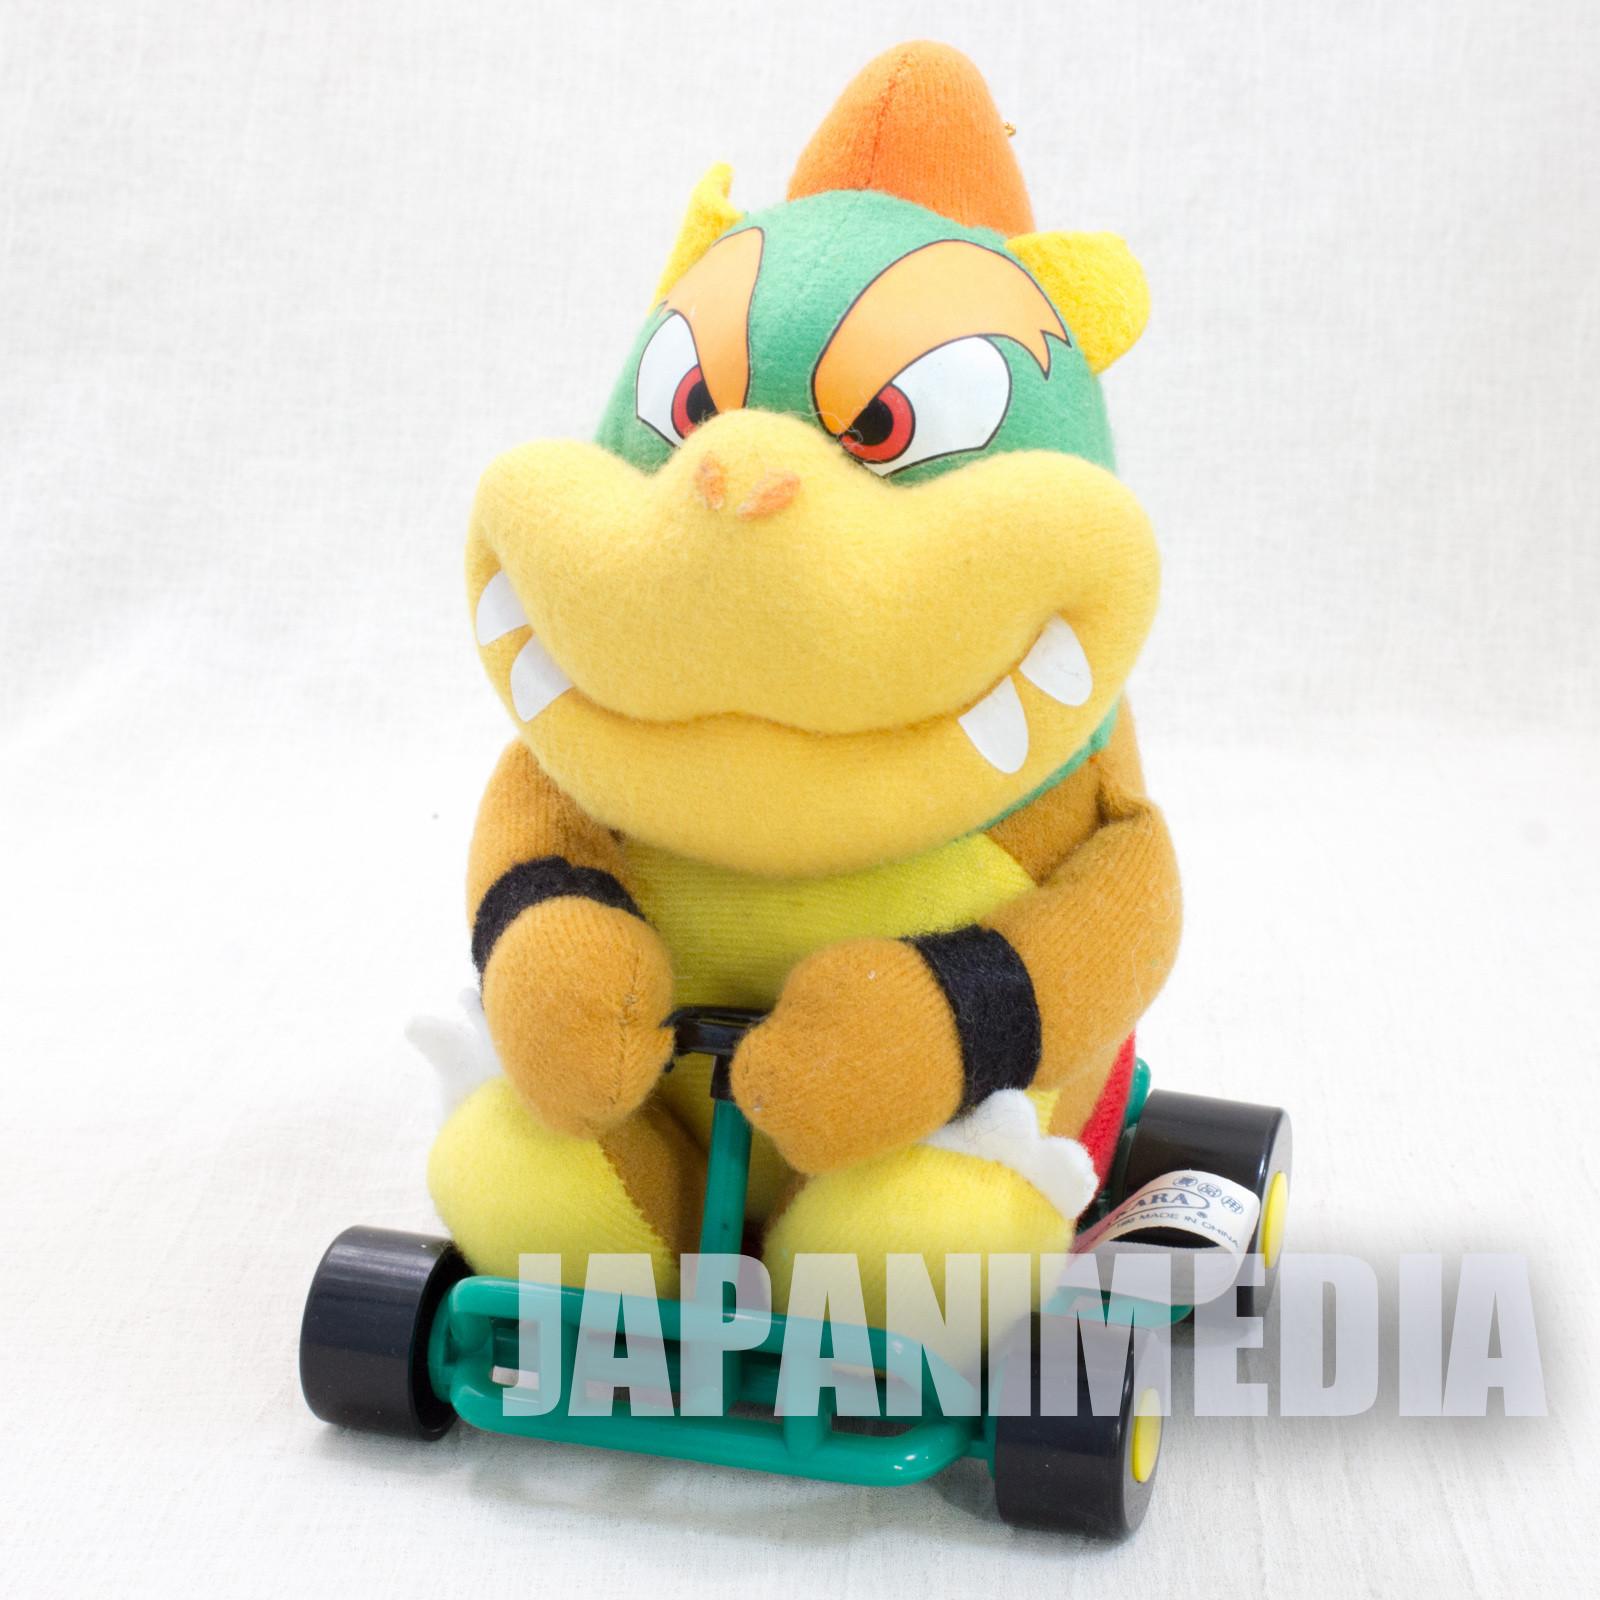 Retro Super Mario Kart Kuppa Bowser Plush Doll TAKARA JAPAN GAME Nintendo Famicom SNES